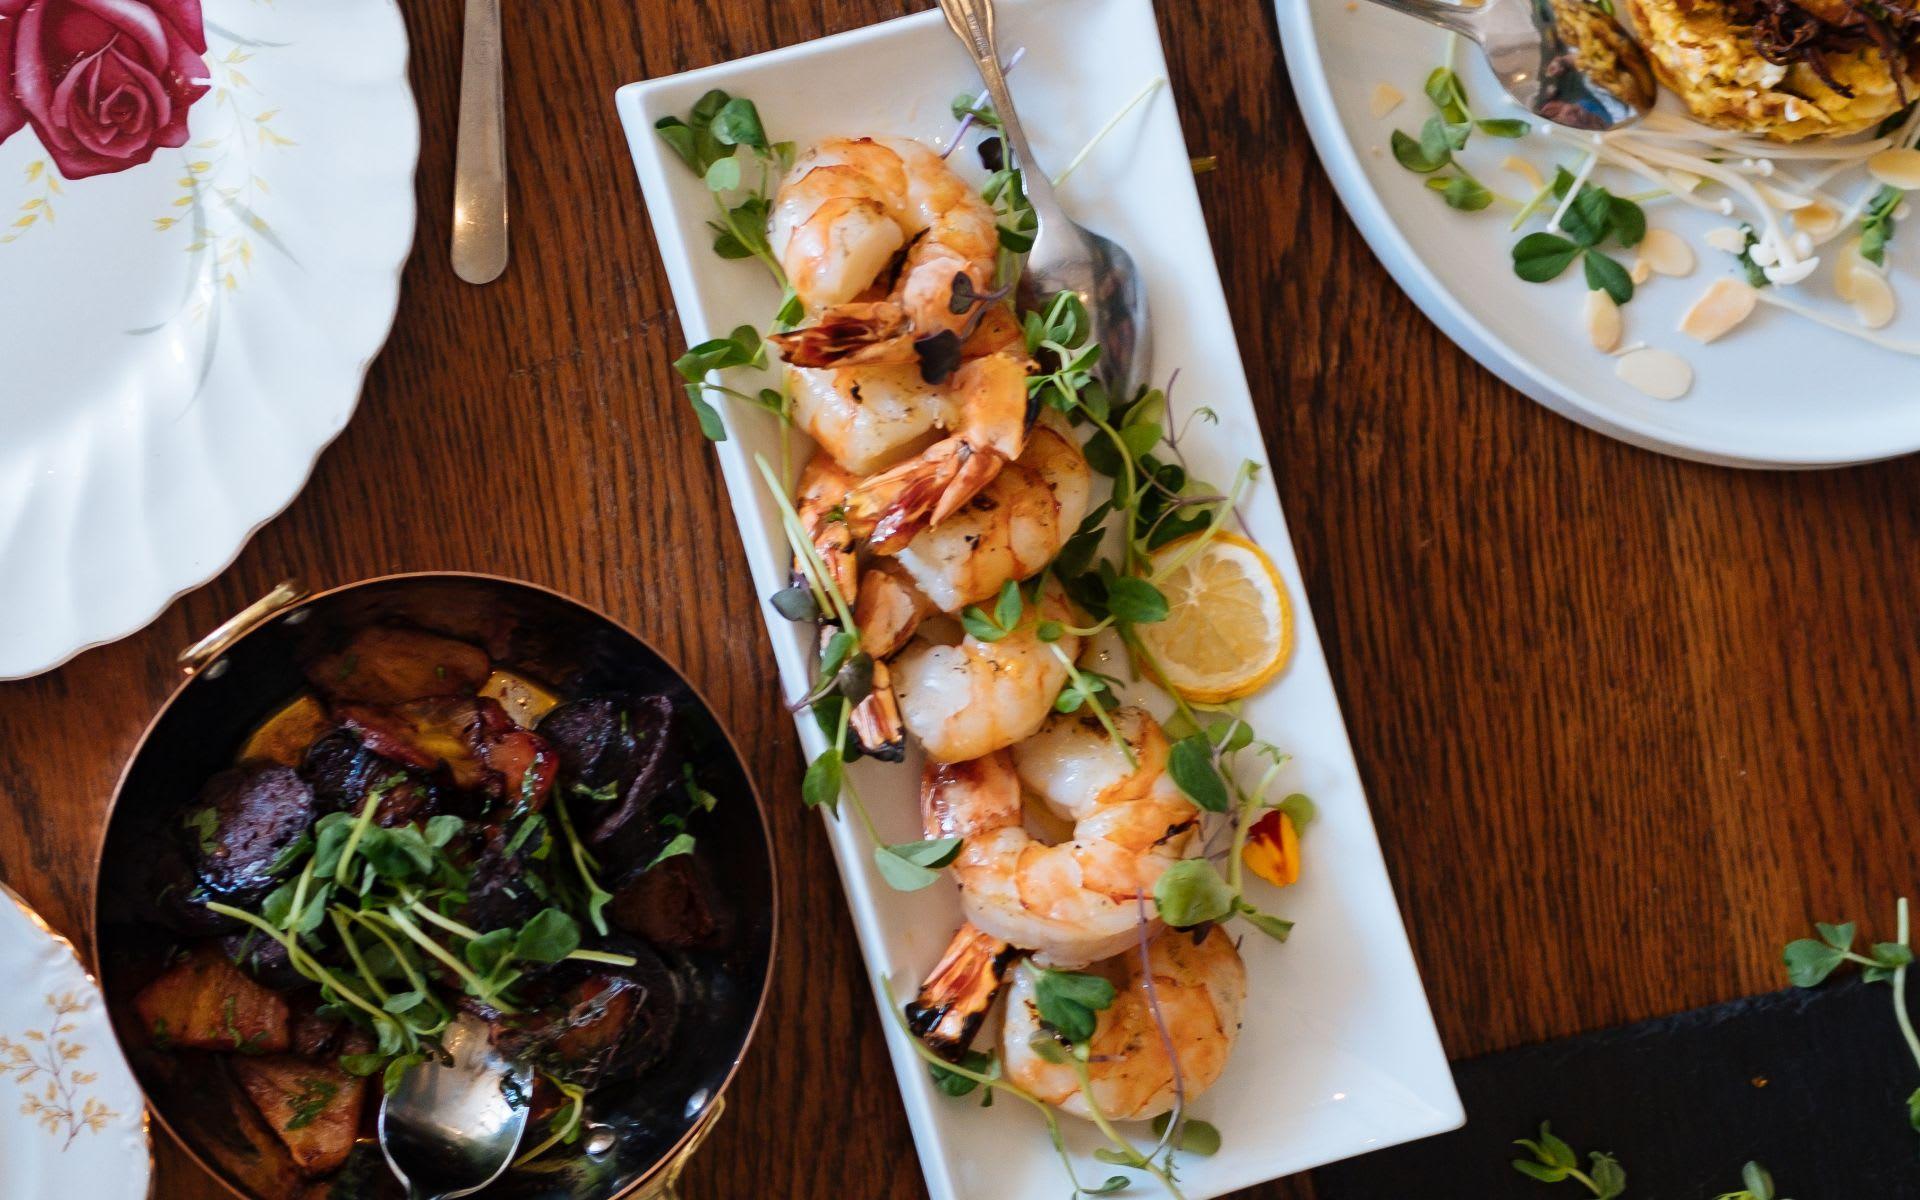 Top 8 Ridgewood Restaurants: Realtor Recommended